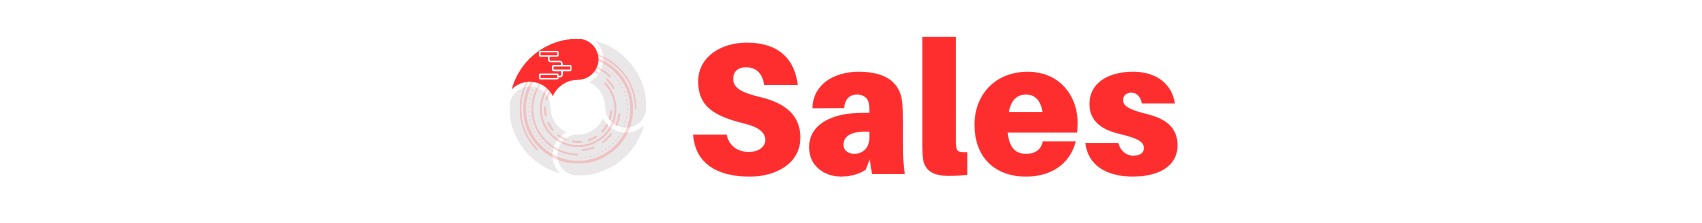 Sales (1)